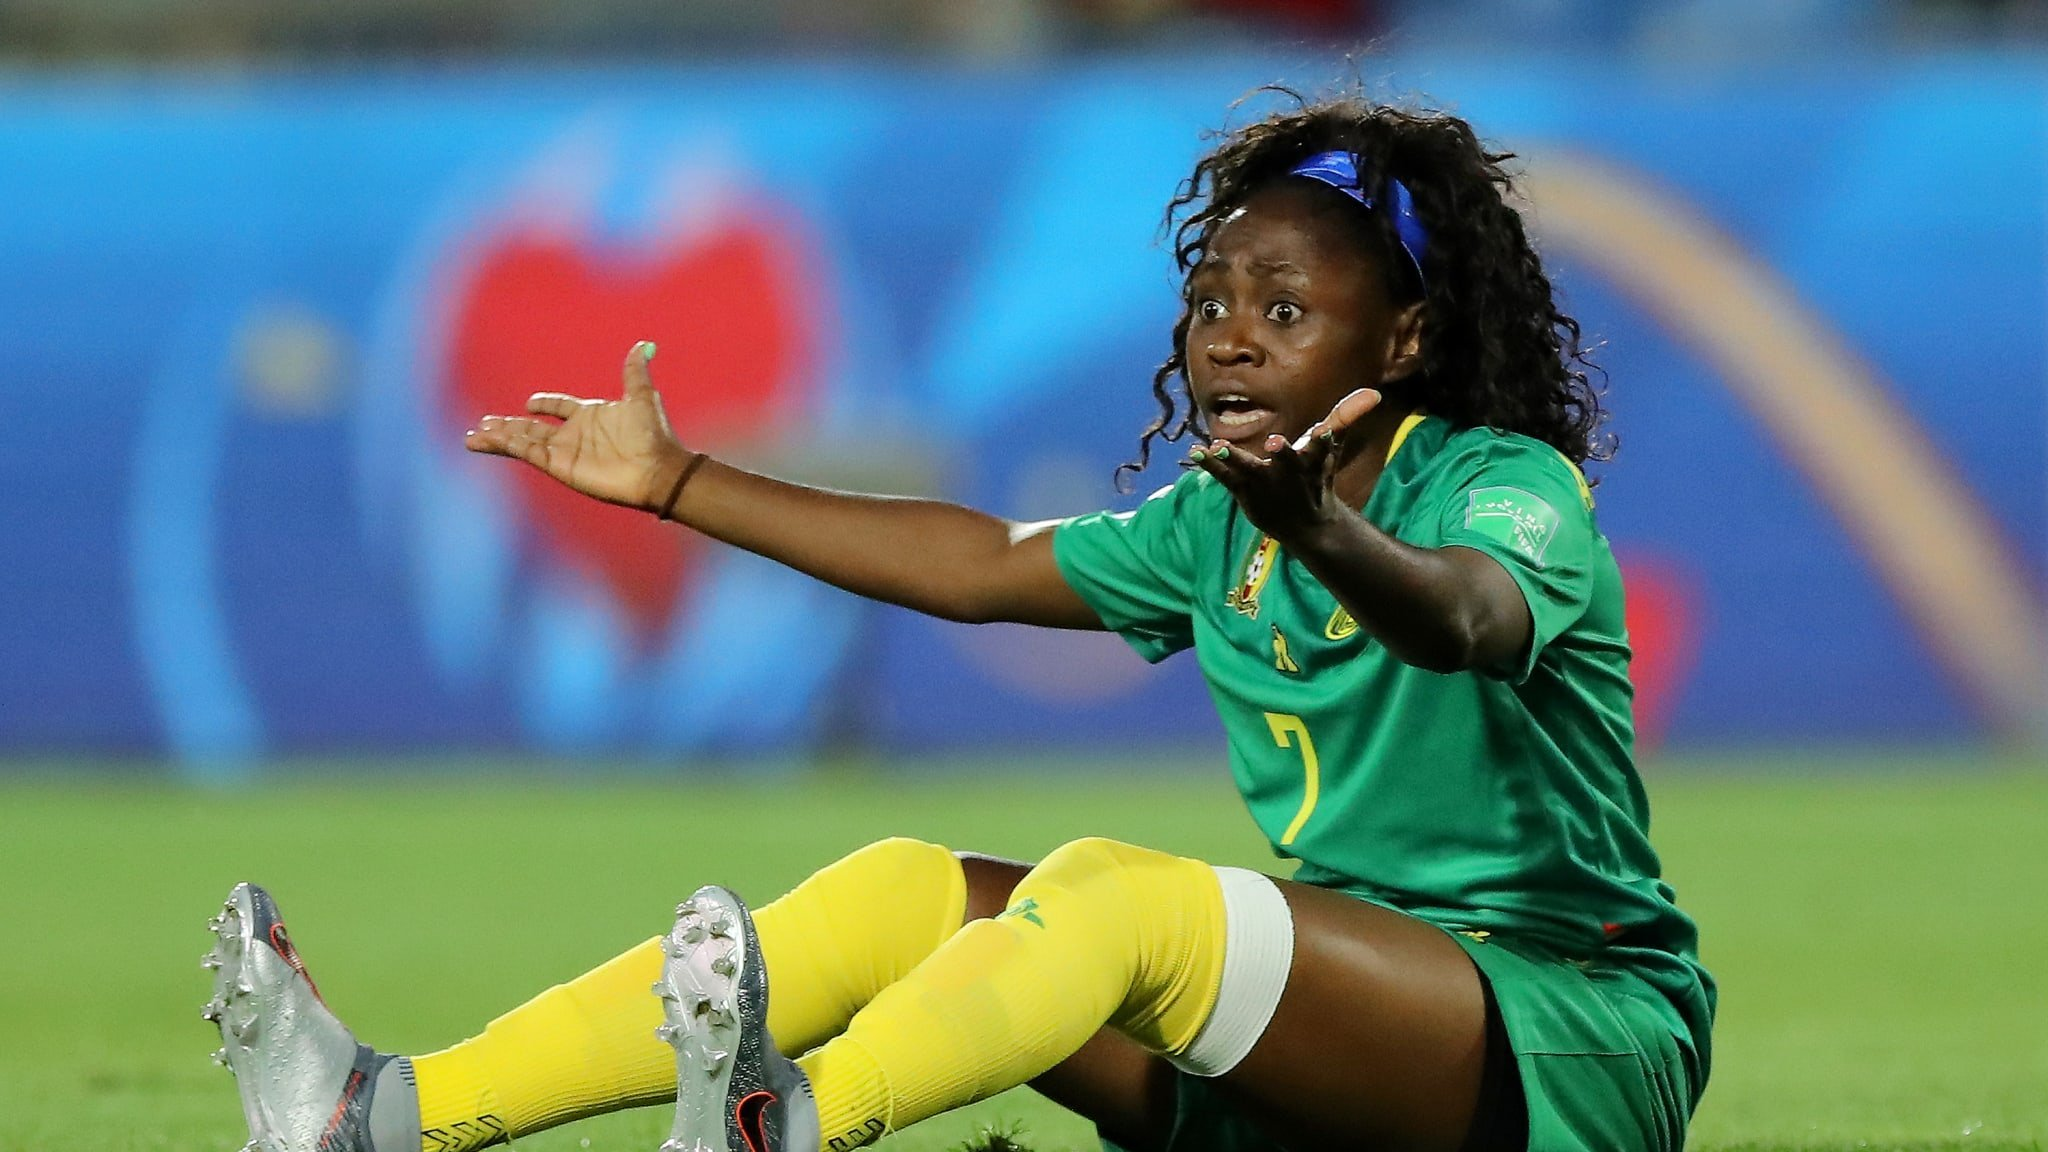 Gabrielle Aboudi Onguene